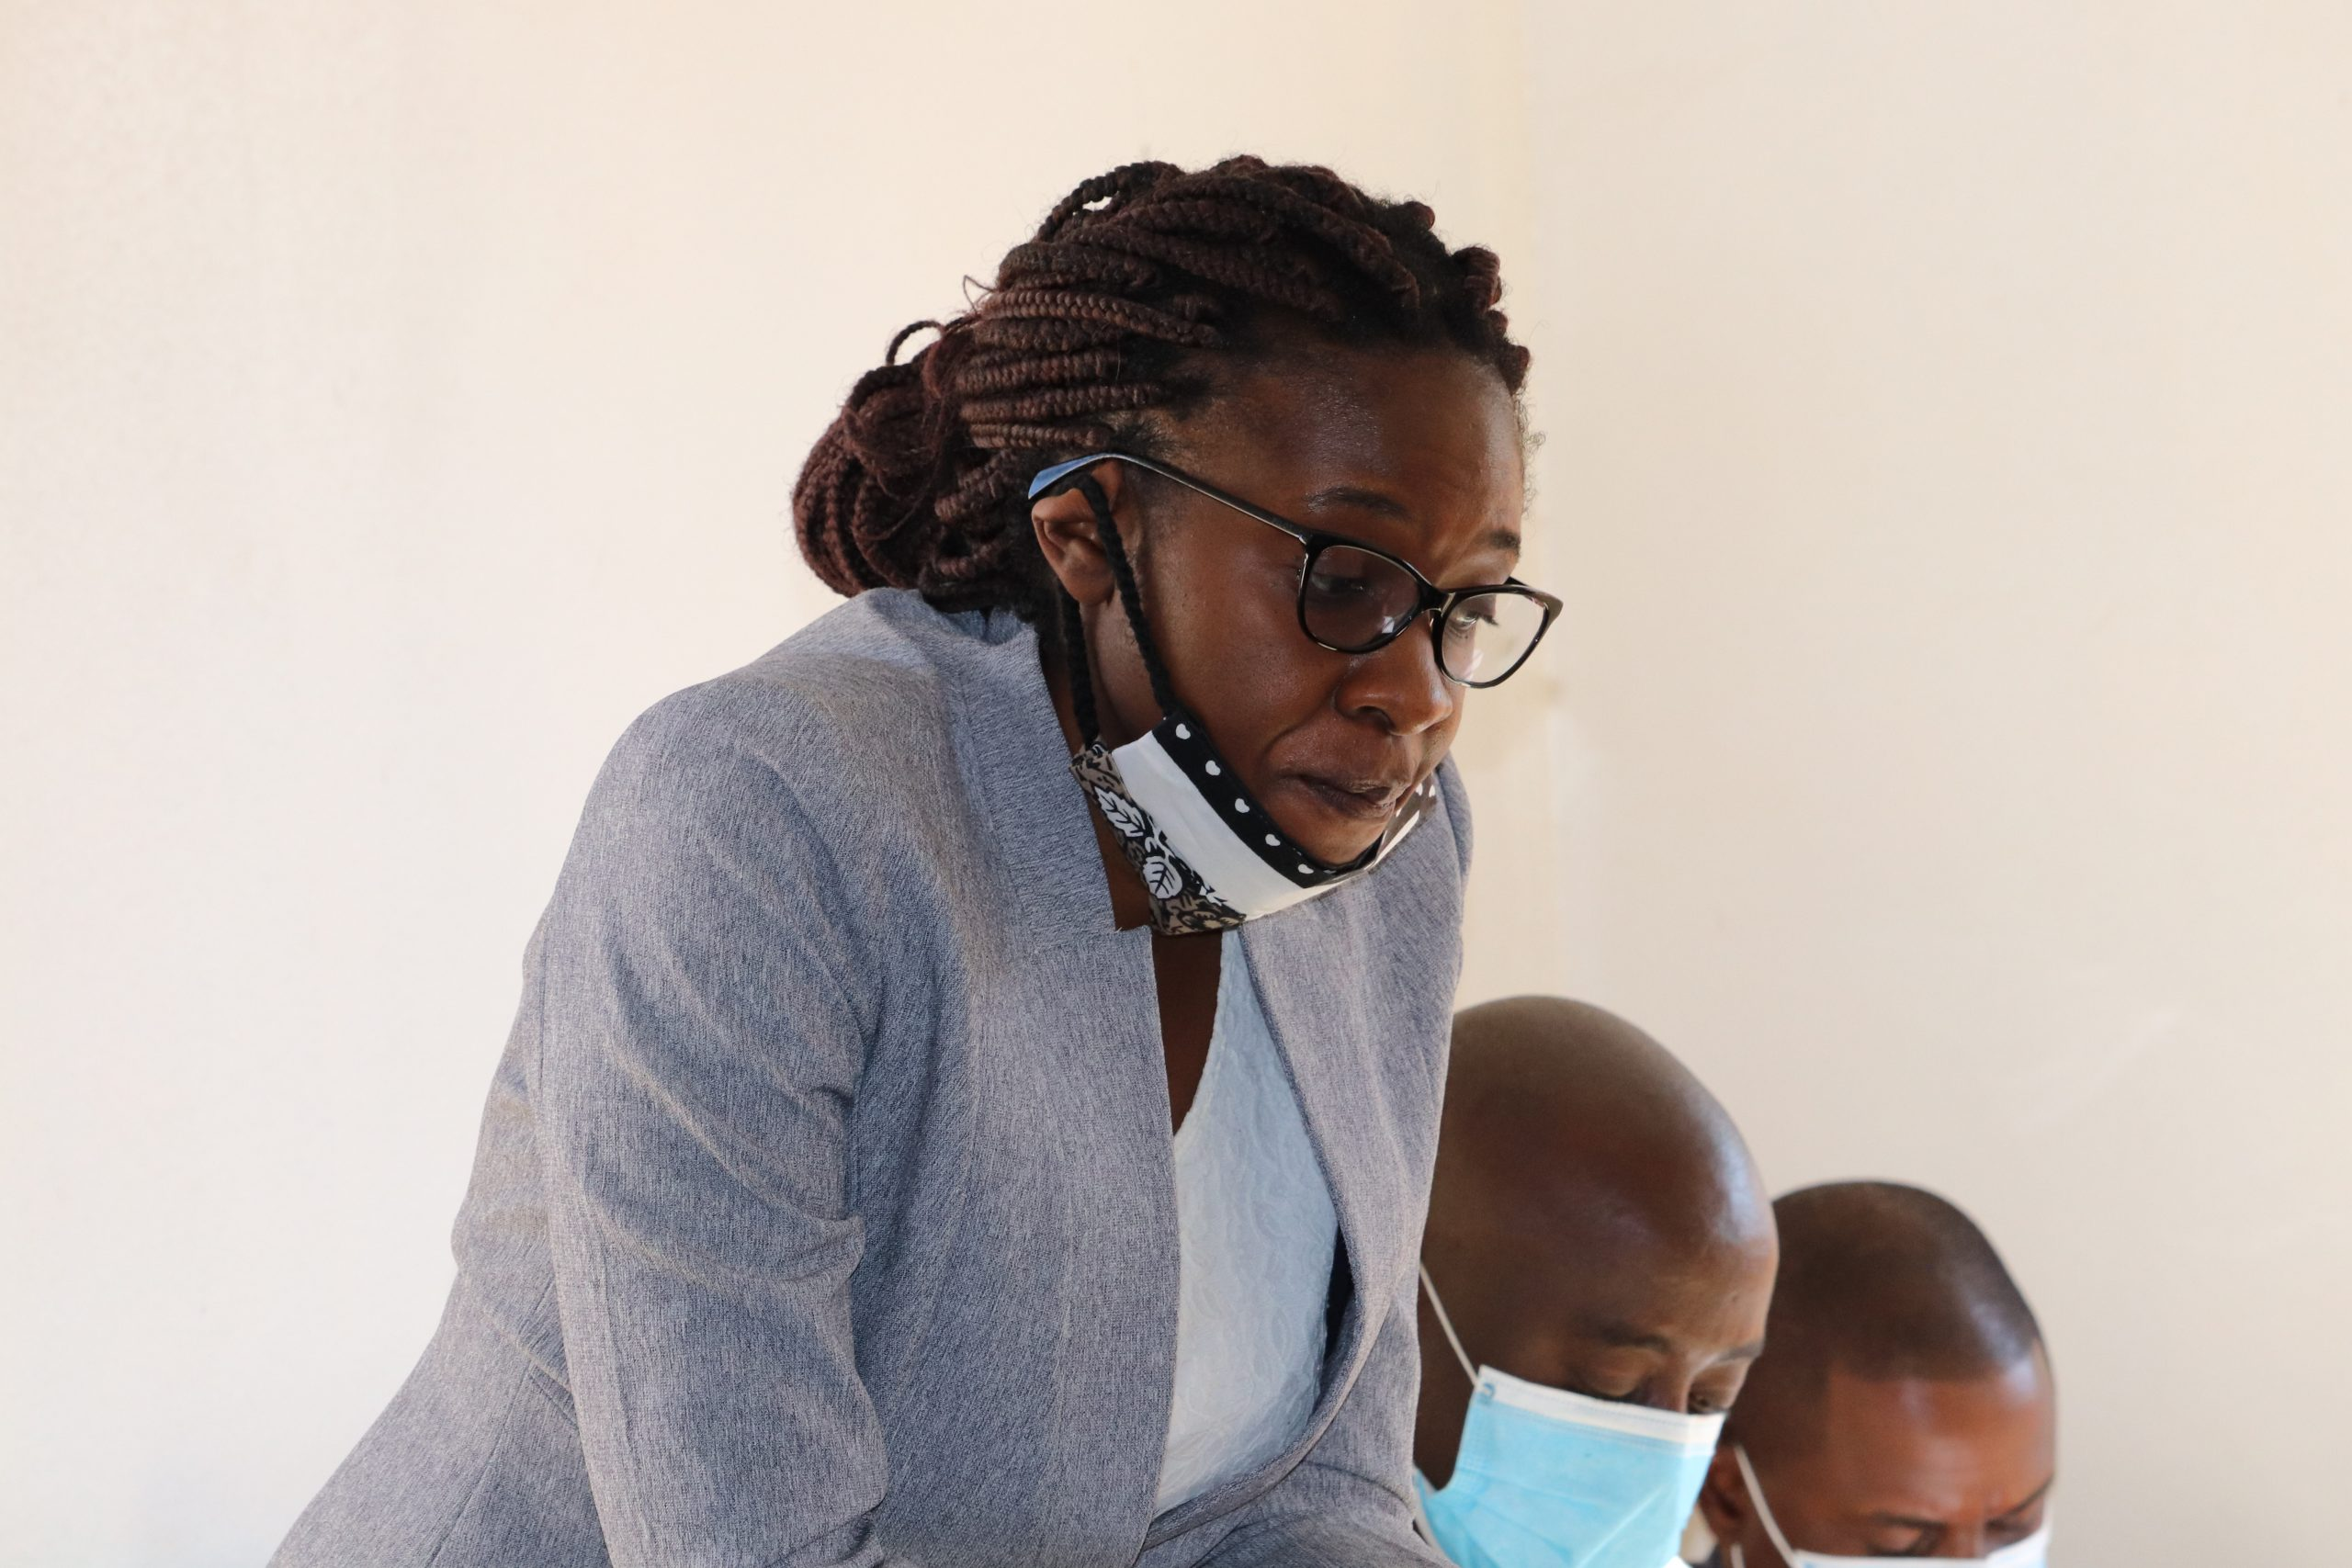 Ms. Inutu Akolwa